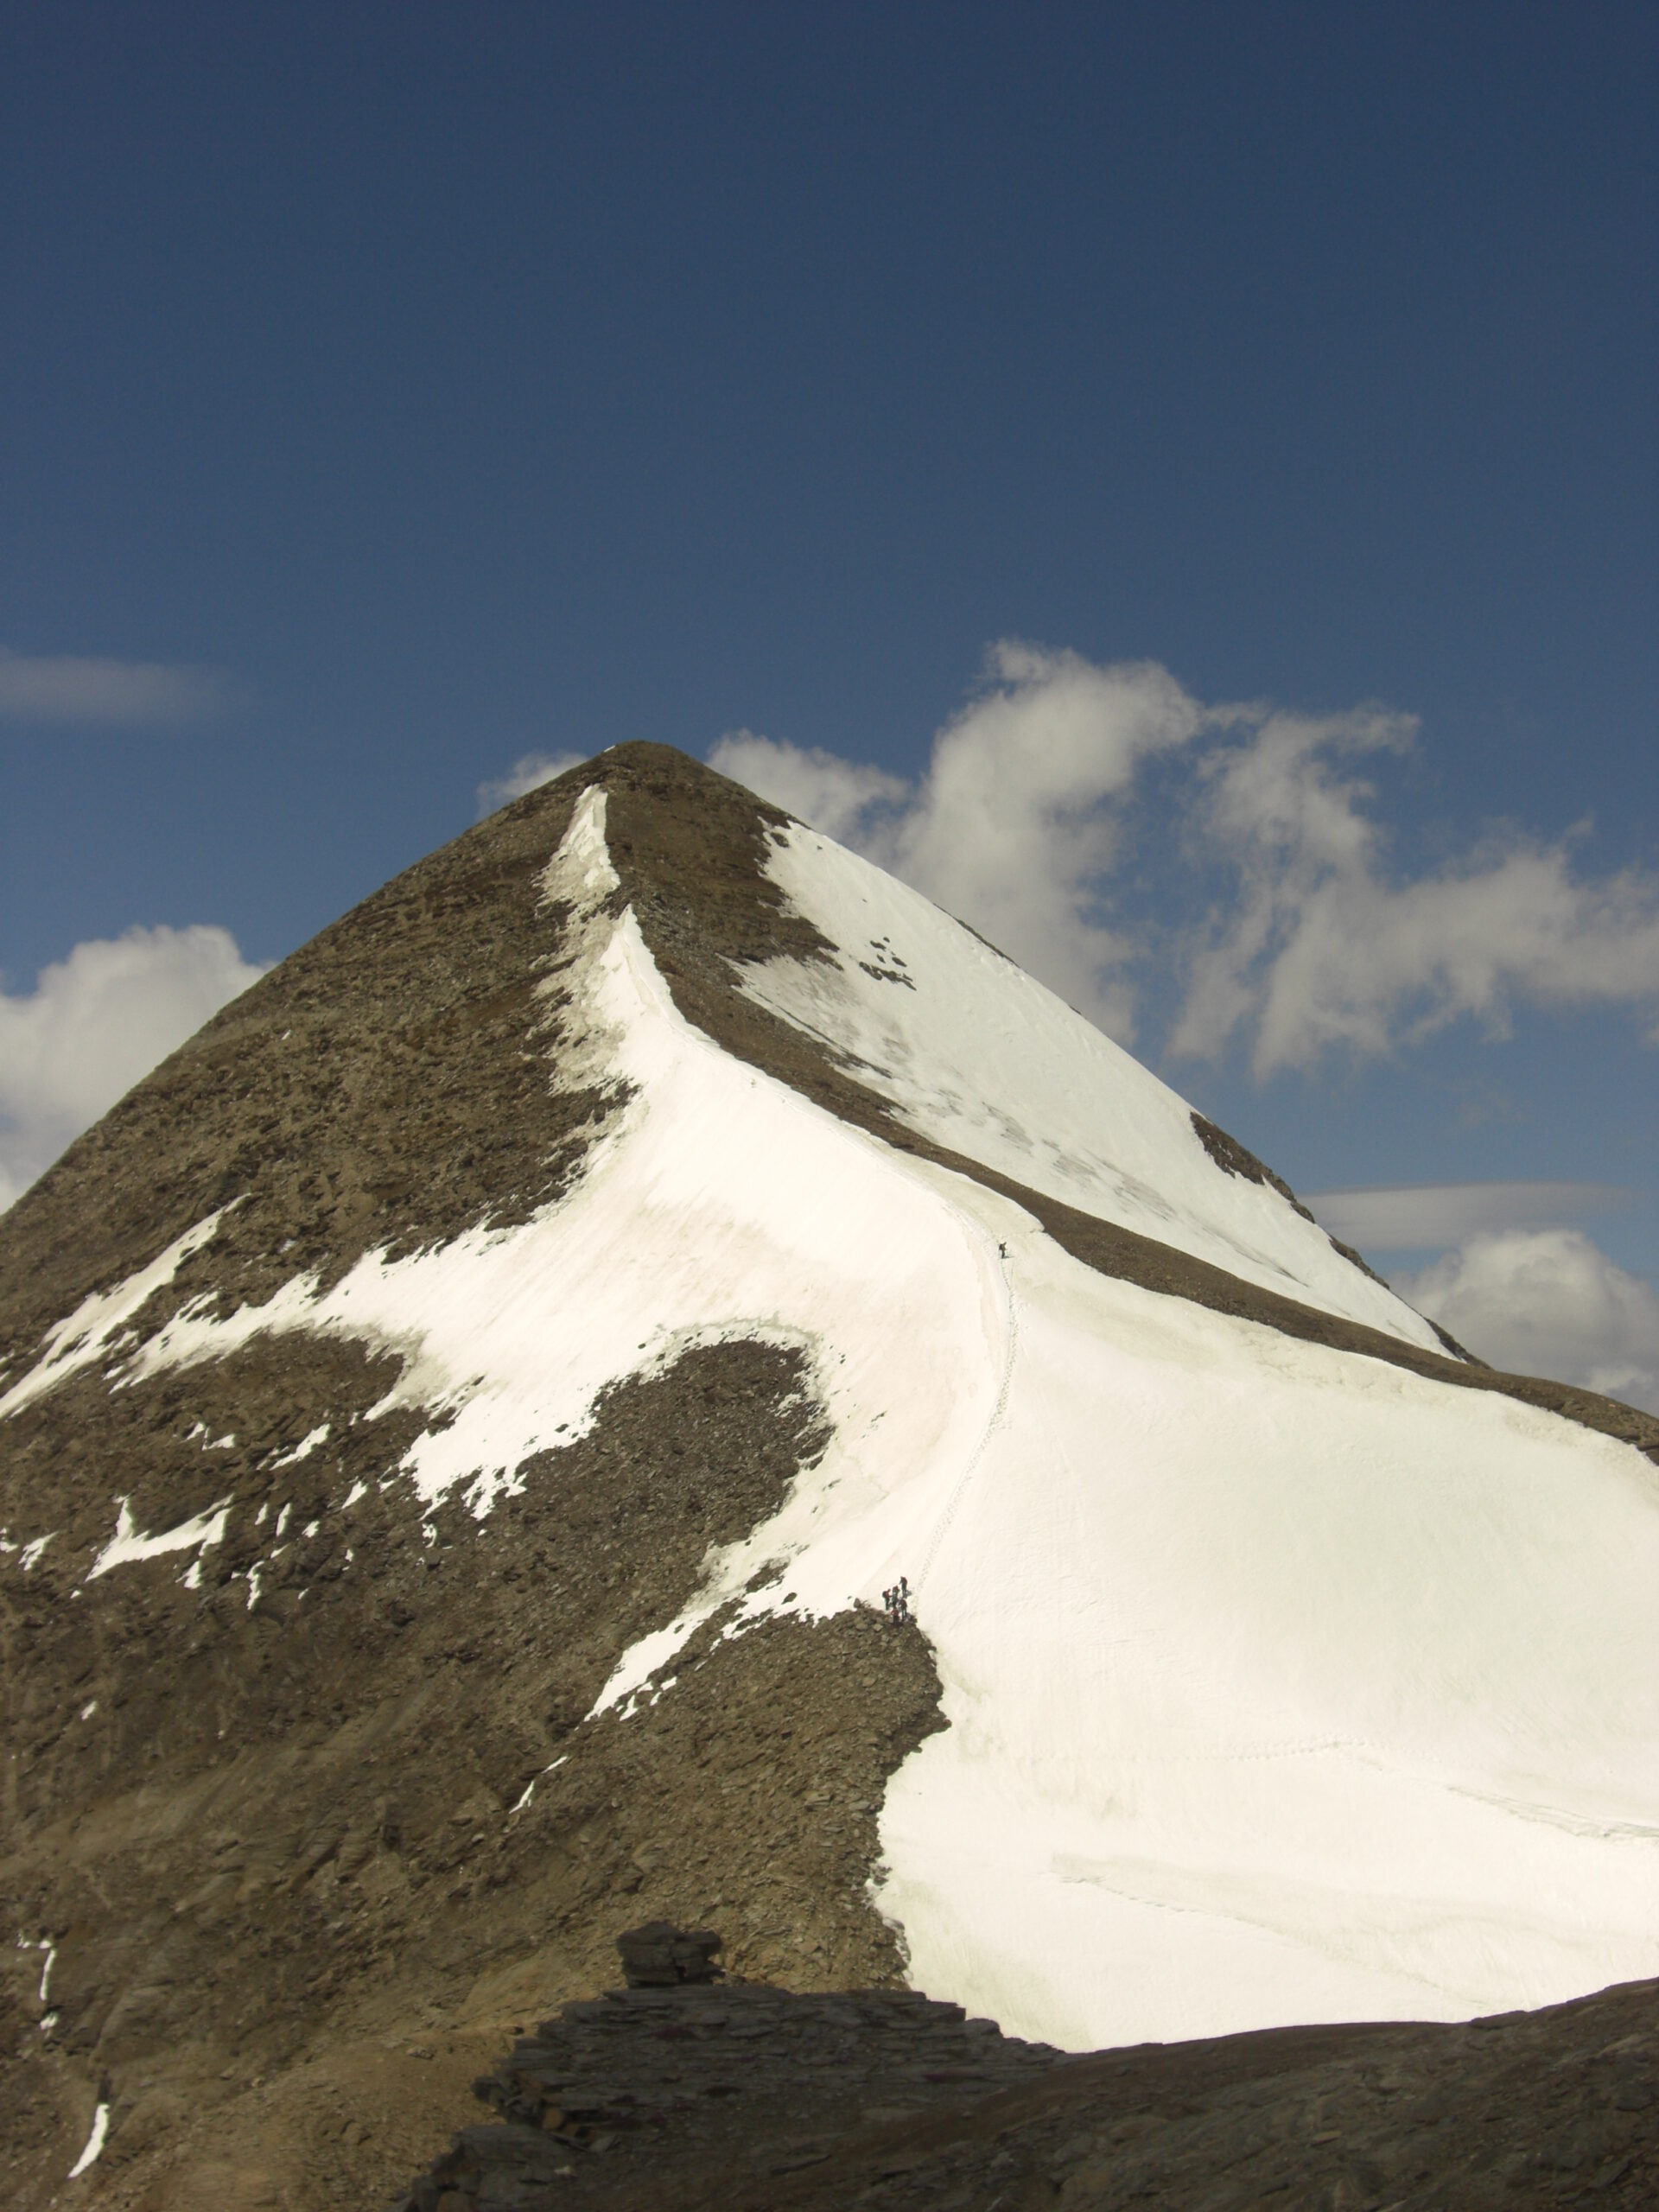 Gipfel, Hohe Tauern